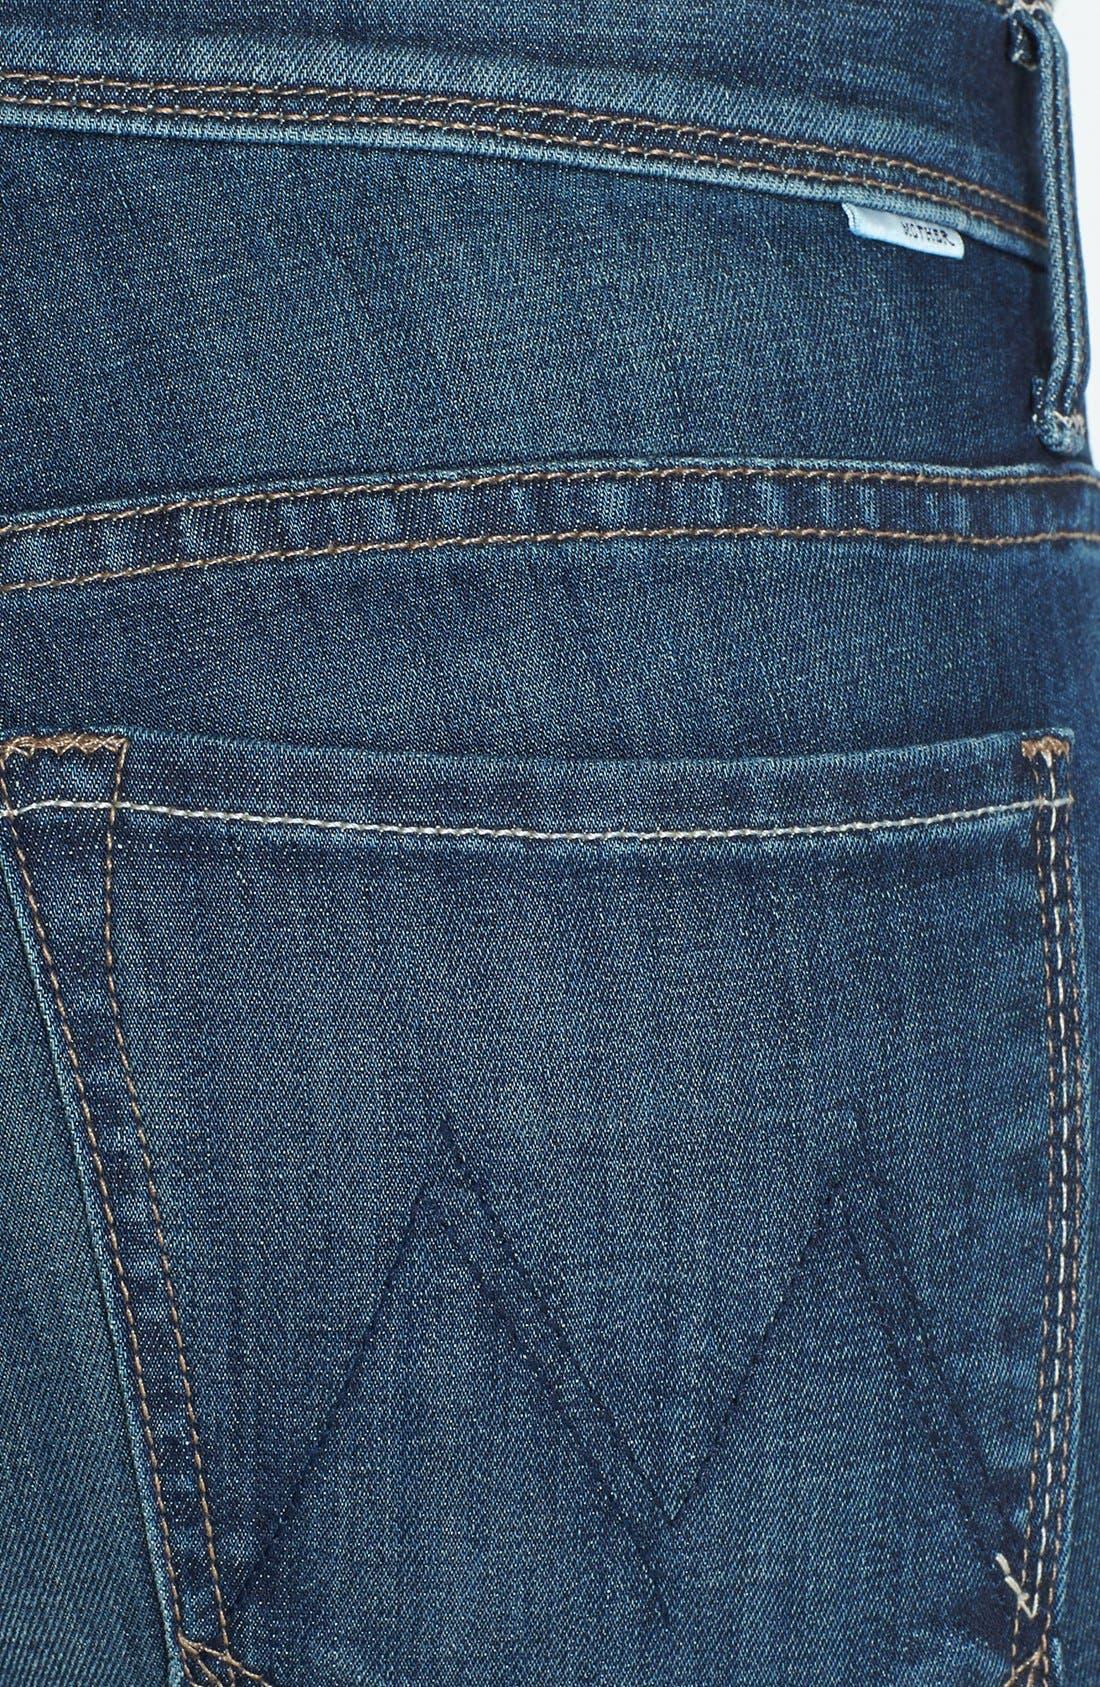 Alternate Image 3  - MOTHER 'Daydreamer' Skinny Flare Leg Jeans (Waltz at Midnight)